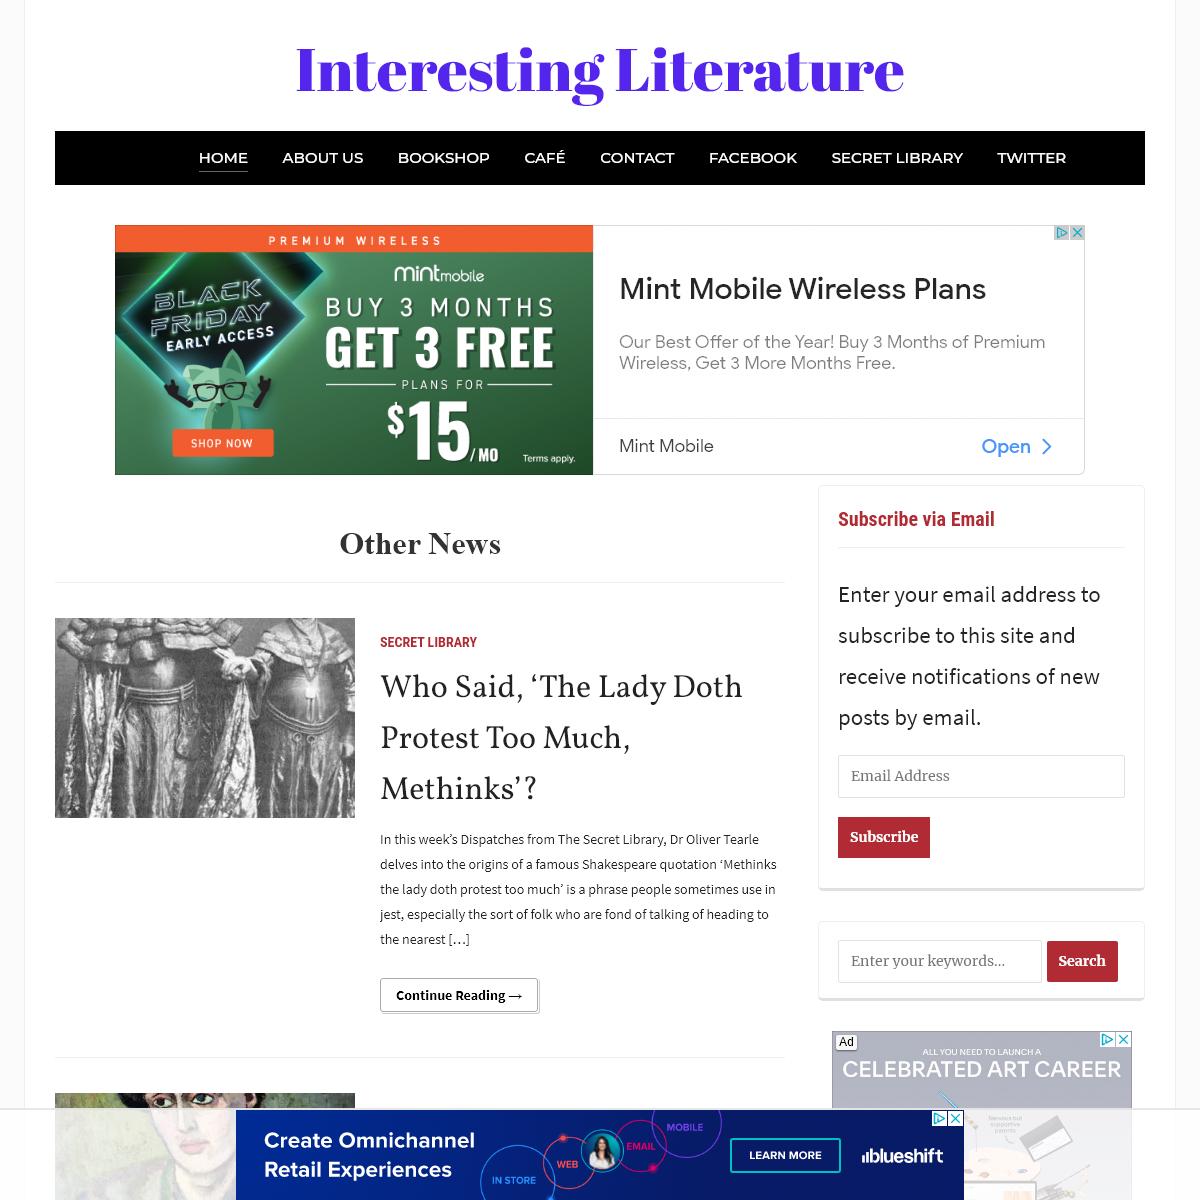 Interesting Literature – A Library of Literary Interestingness